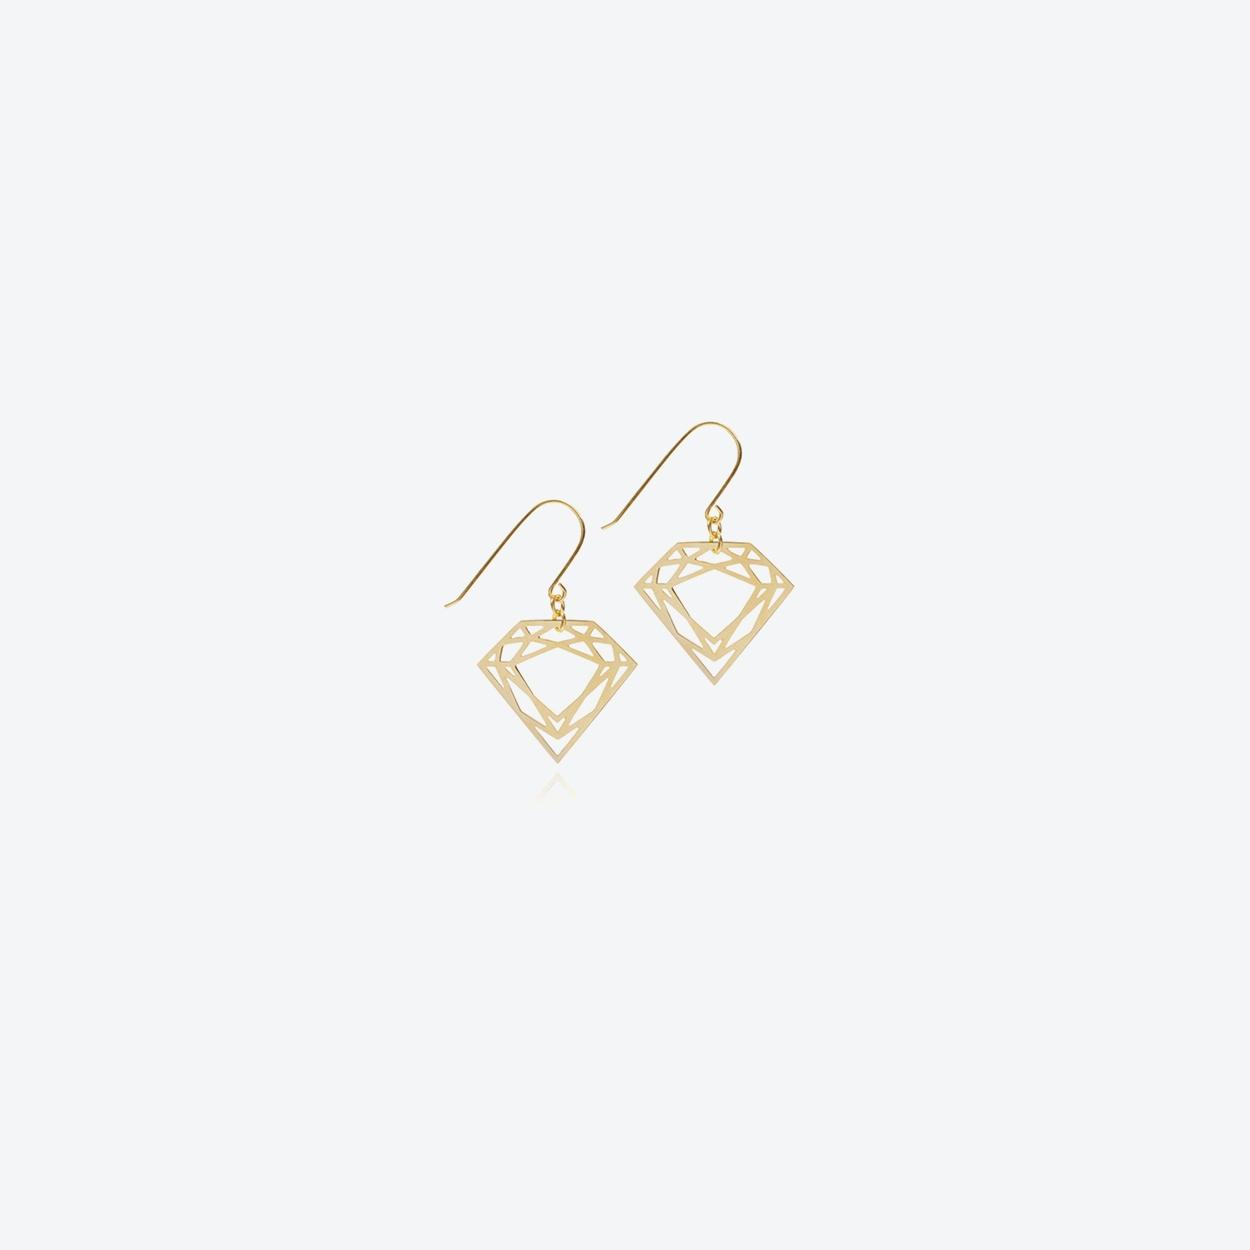 Classic Diamond Drop Earrings in Gold